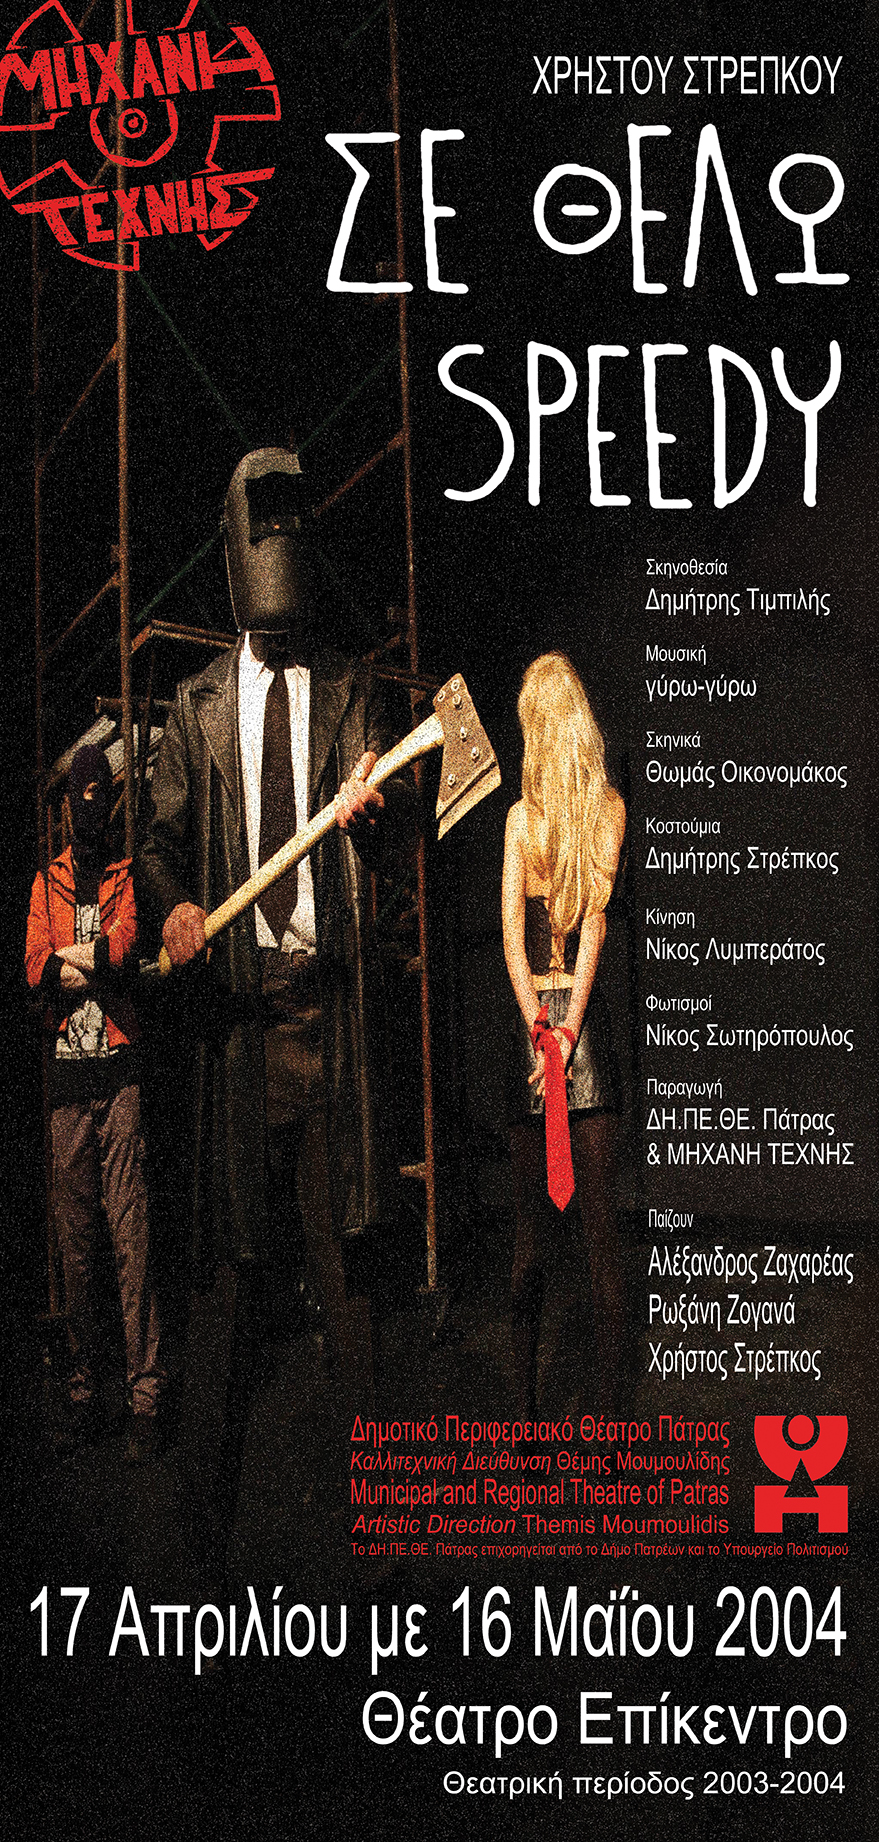 2004 I Want You Speedy by Christos Strepkos Poster.jpg